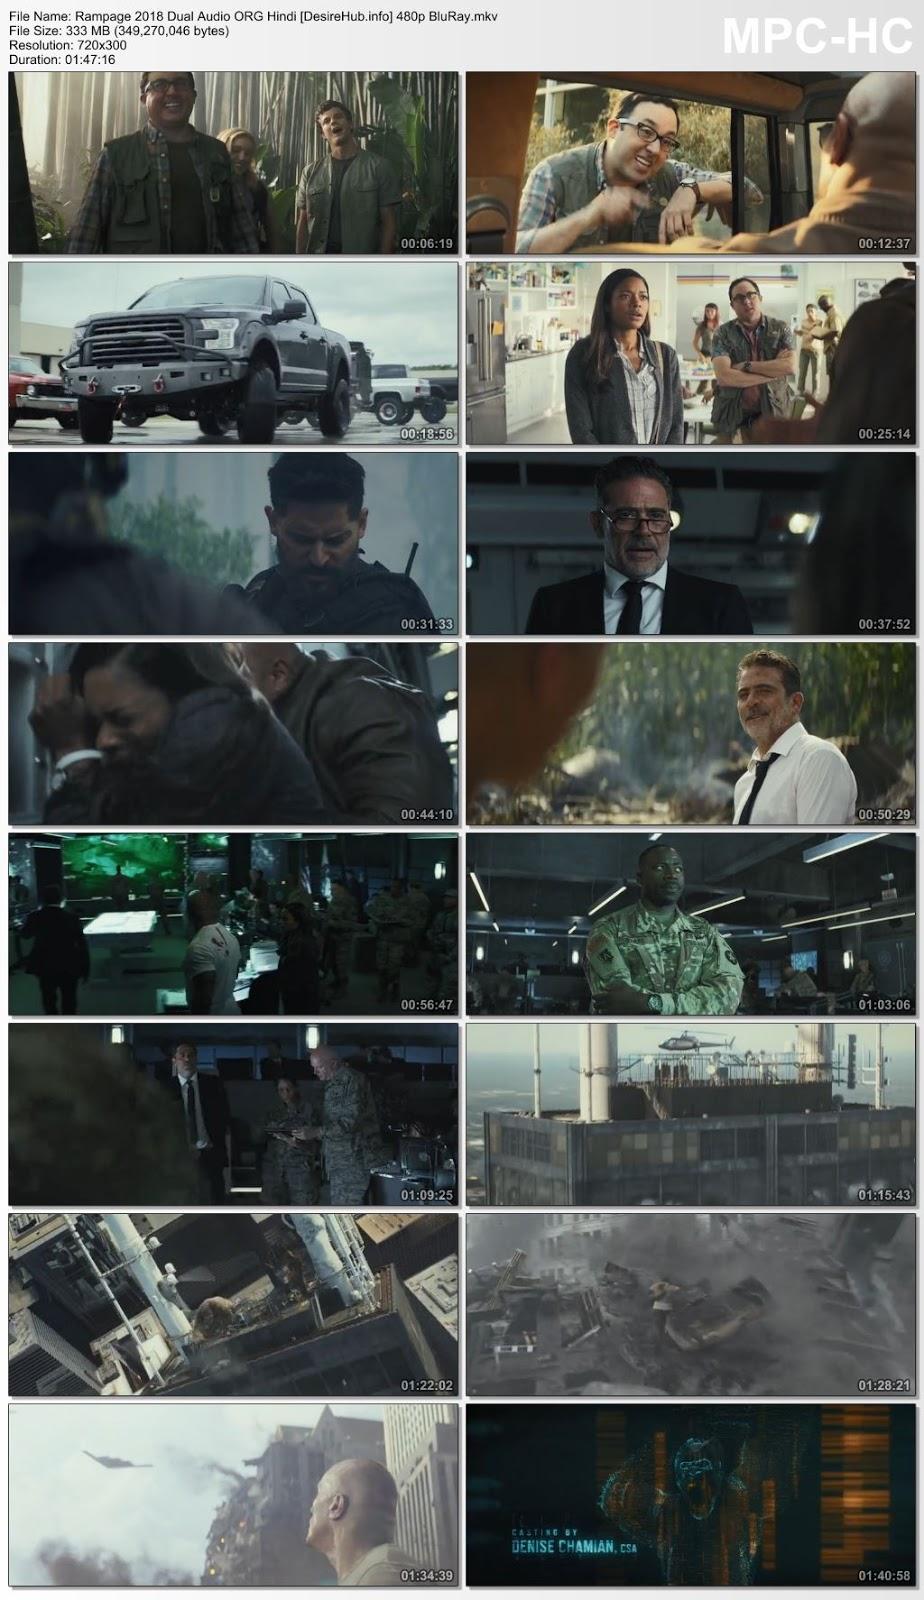 Rampage 2018 Dual Audio ORG Hindi 480p BluRay 300MB Desirehub